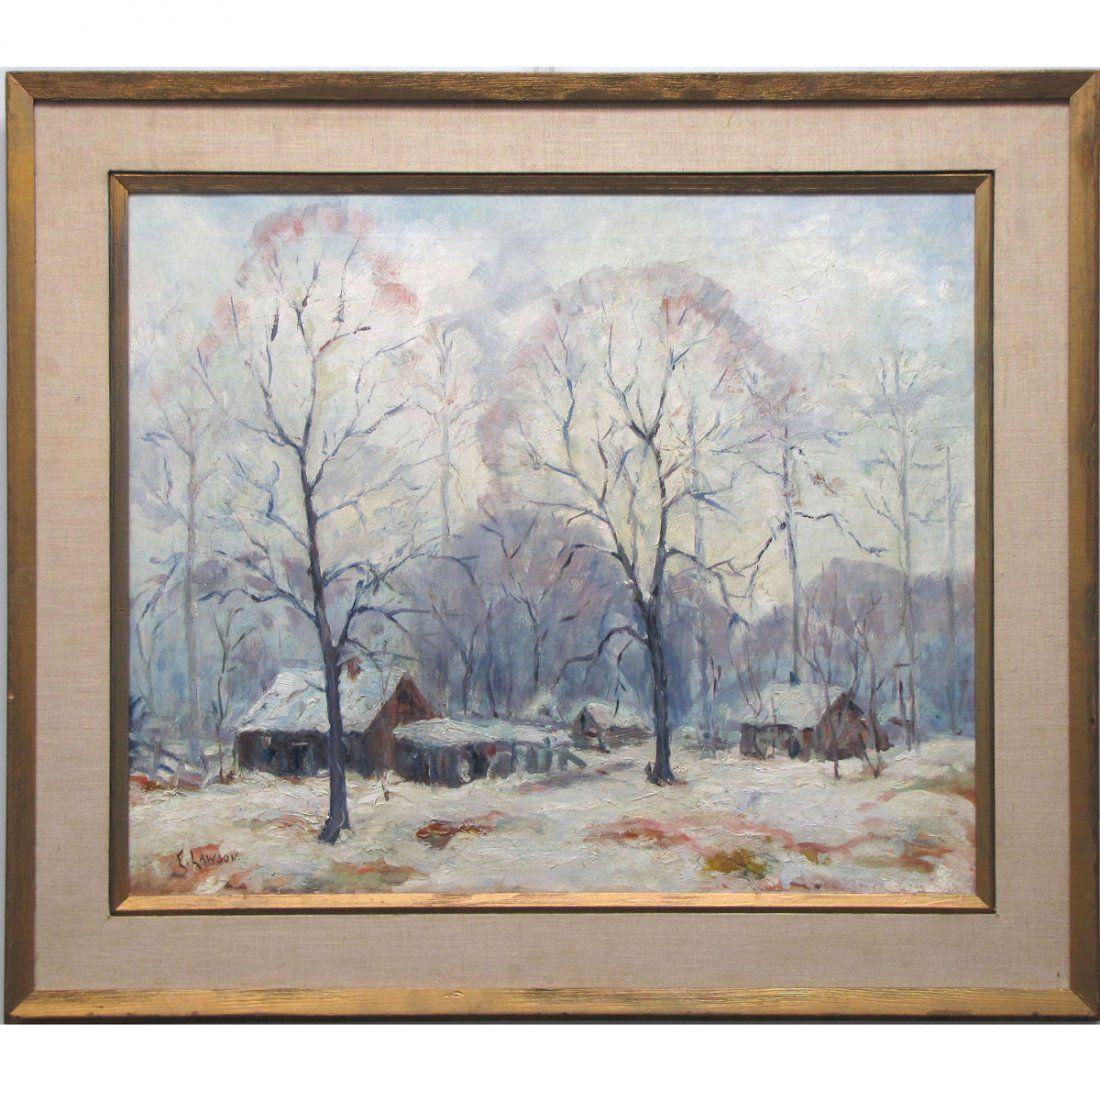 ERNEST LAWSON (AMERICAN NY/CT 1873-1939), OIL